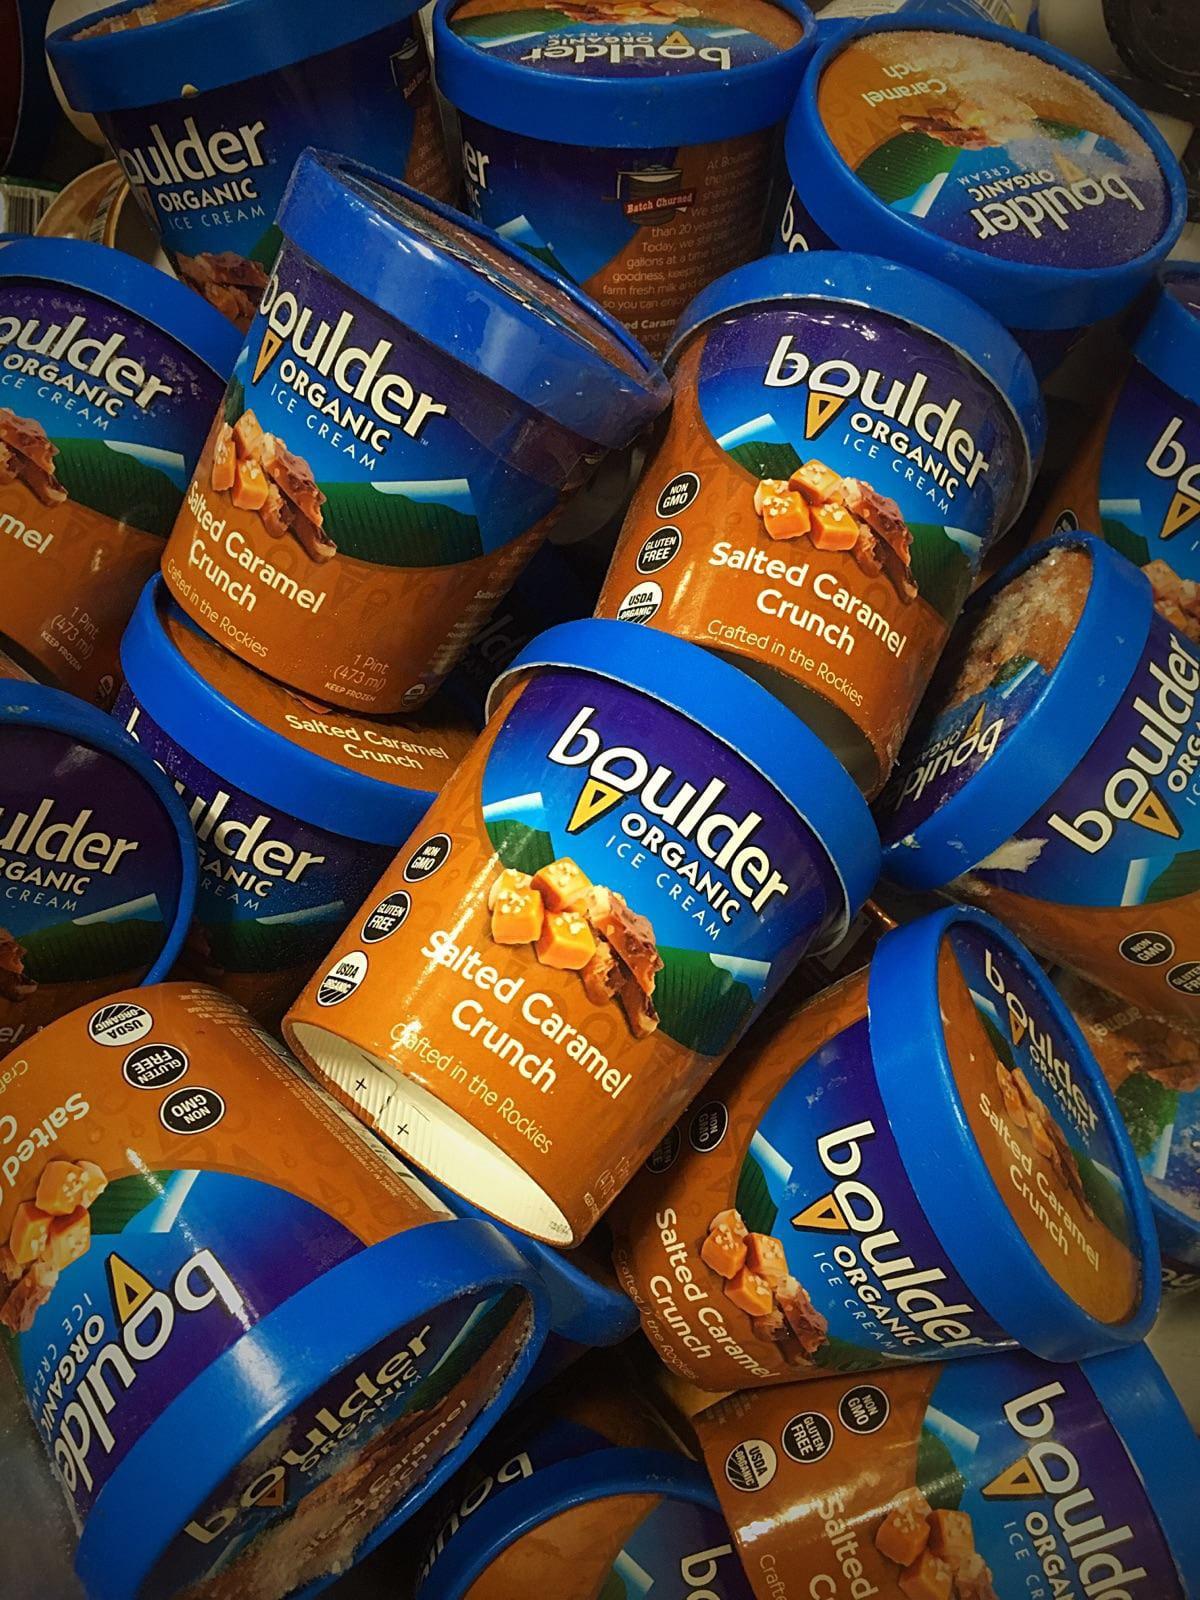 Boulder Organic Ice Cream Salted Caramel Crunch Pints